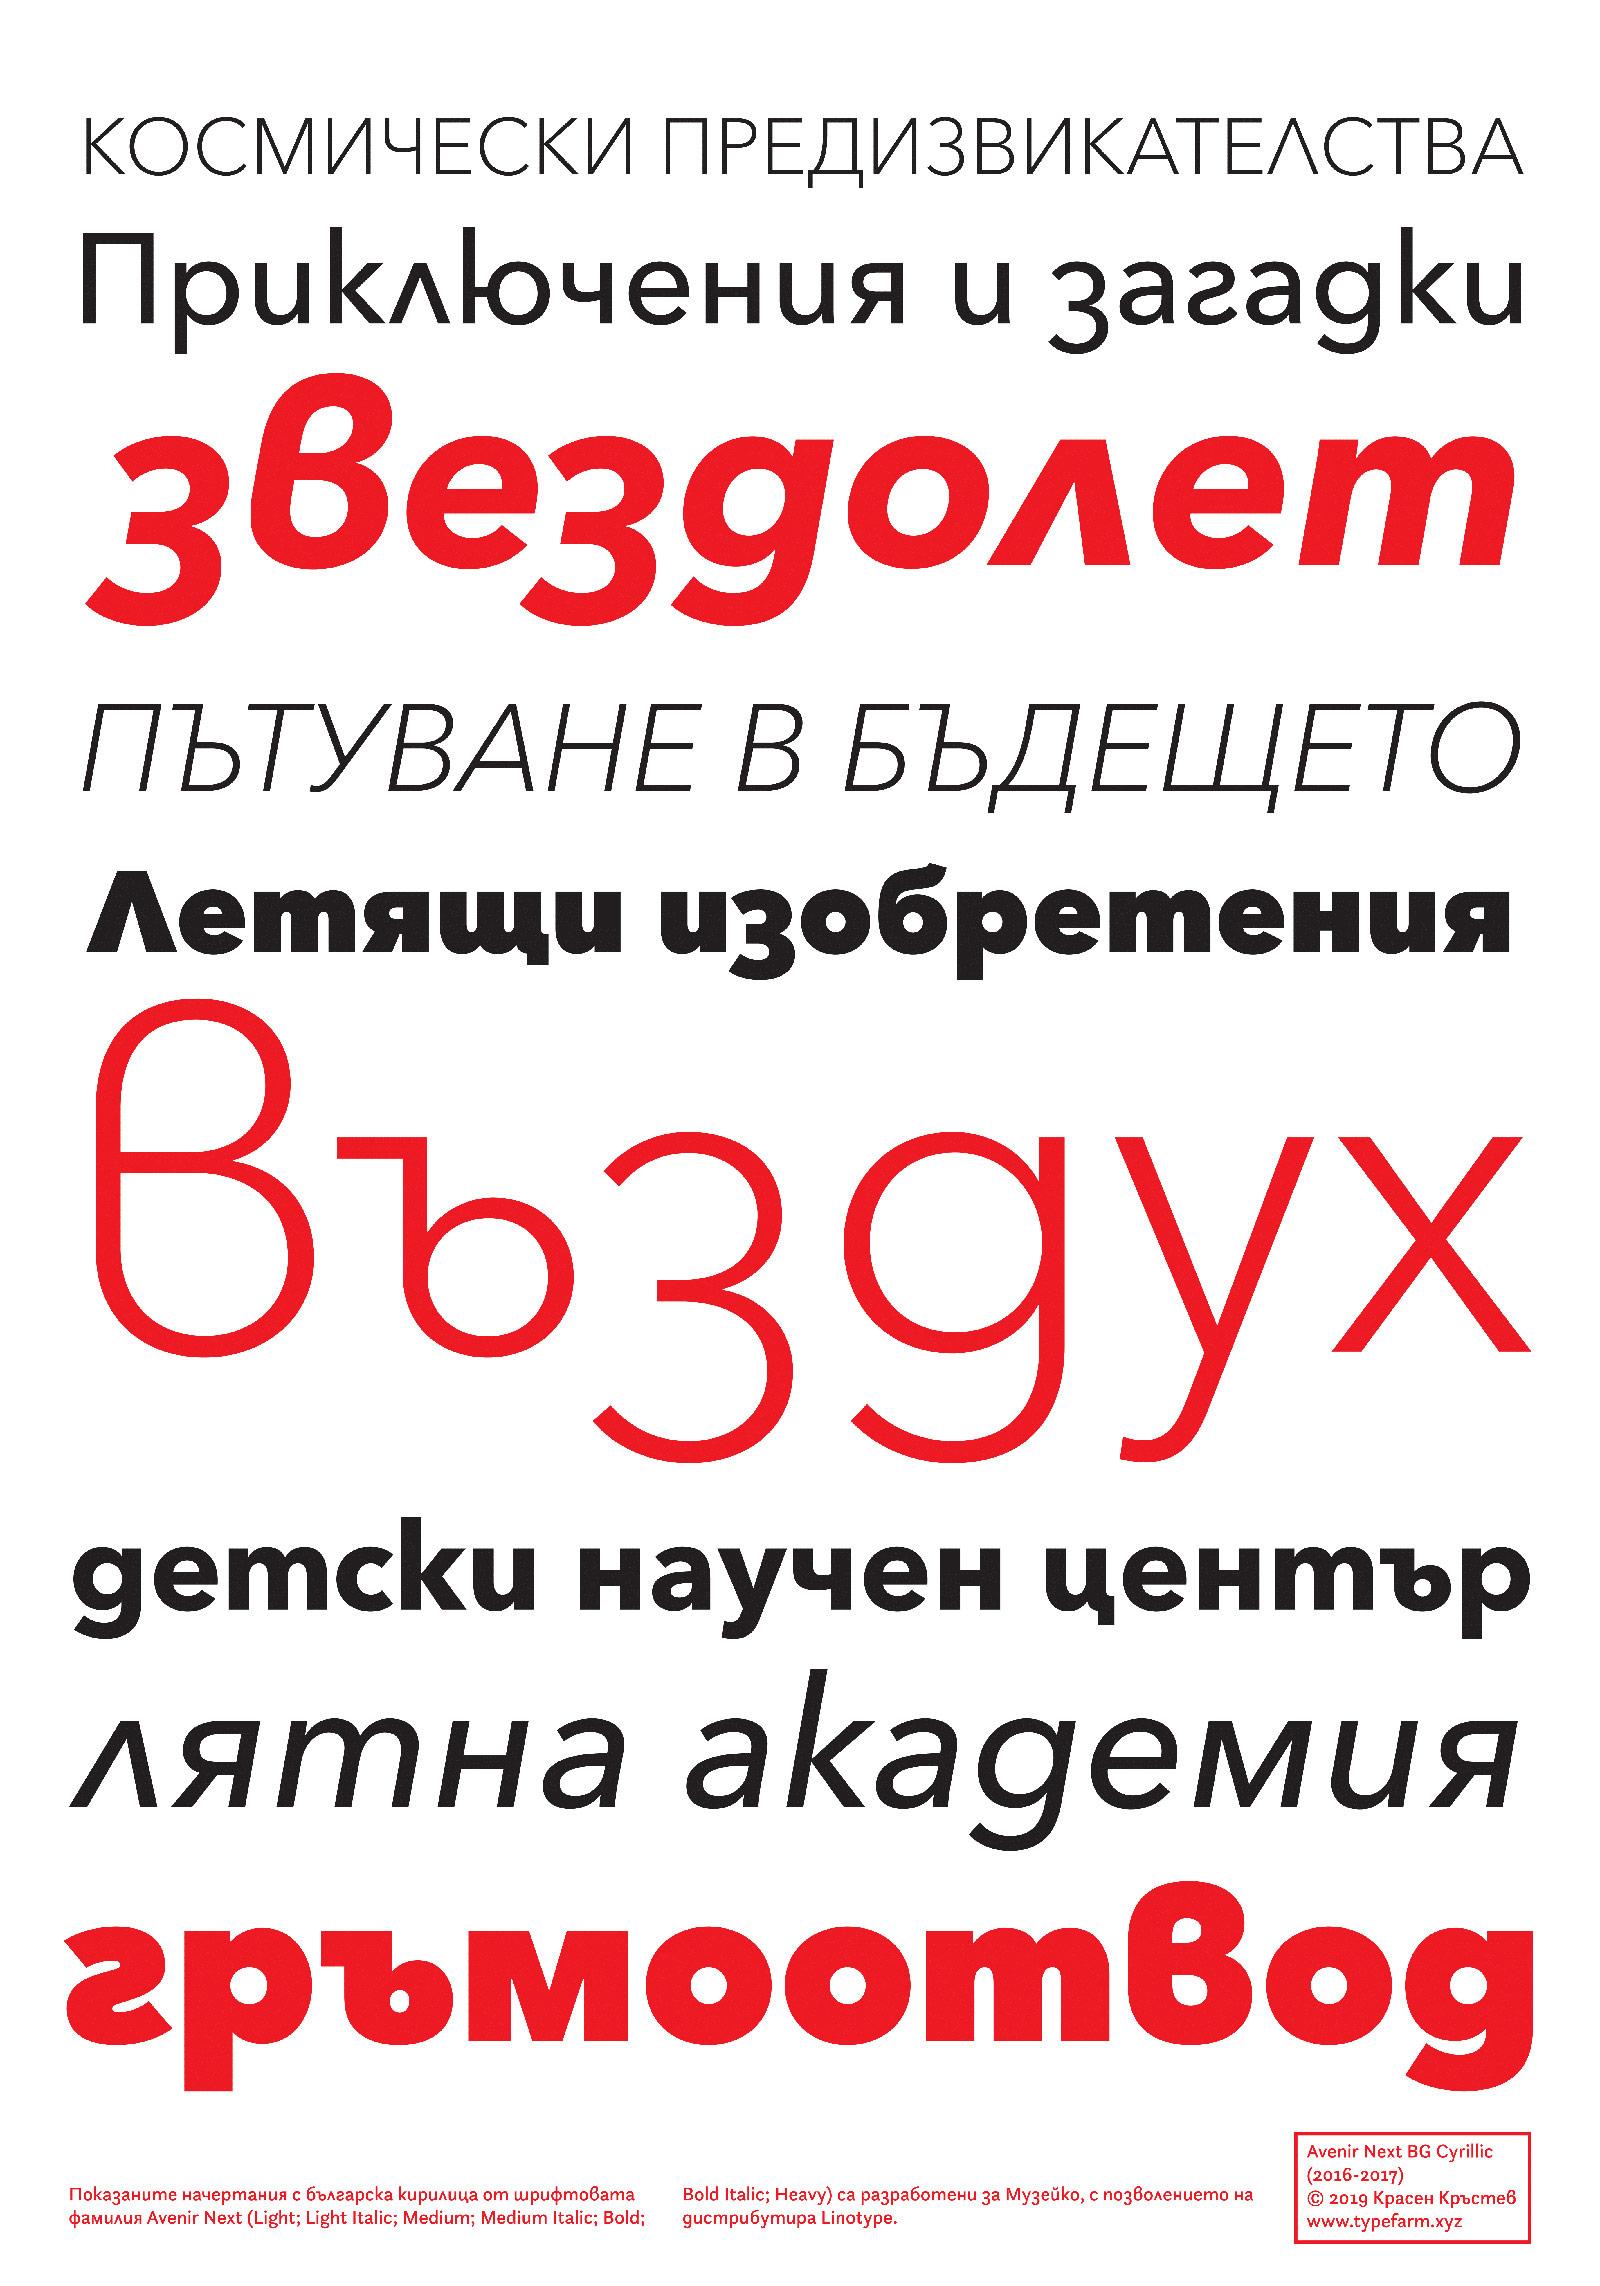 Krassen Krestev ∙ New Bulgarian Typography II